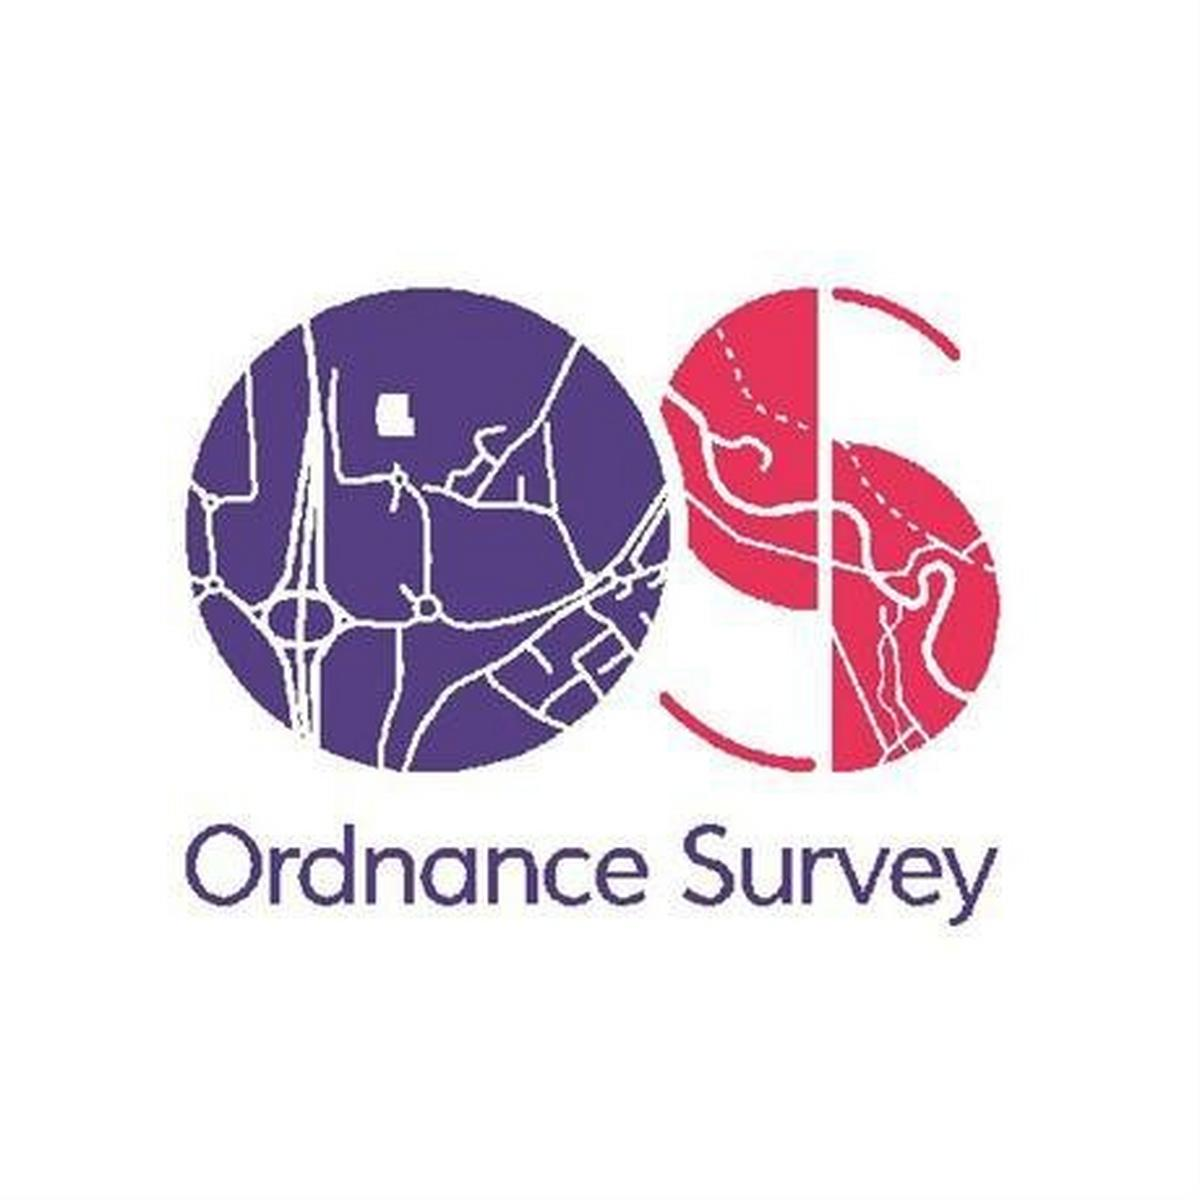 Ordnance Survey OS Landranger Map 77 Dalmellington & New Galloway, Galloway Forest Park